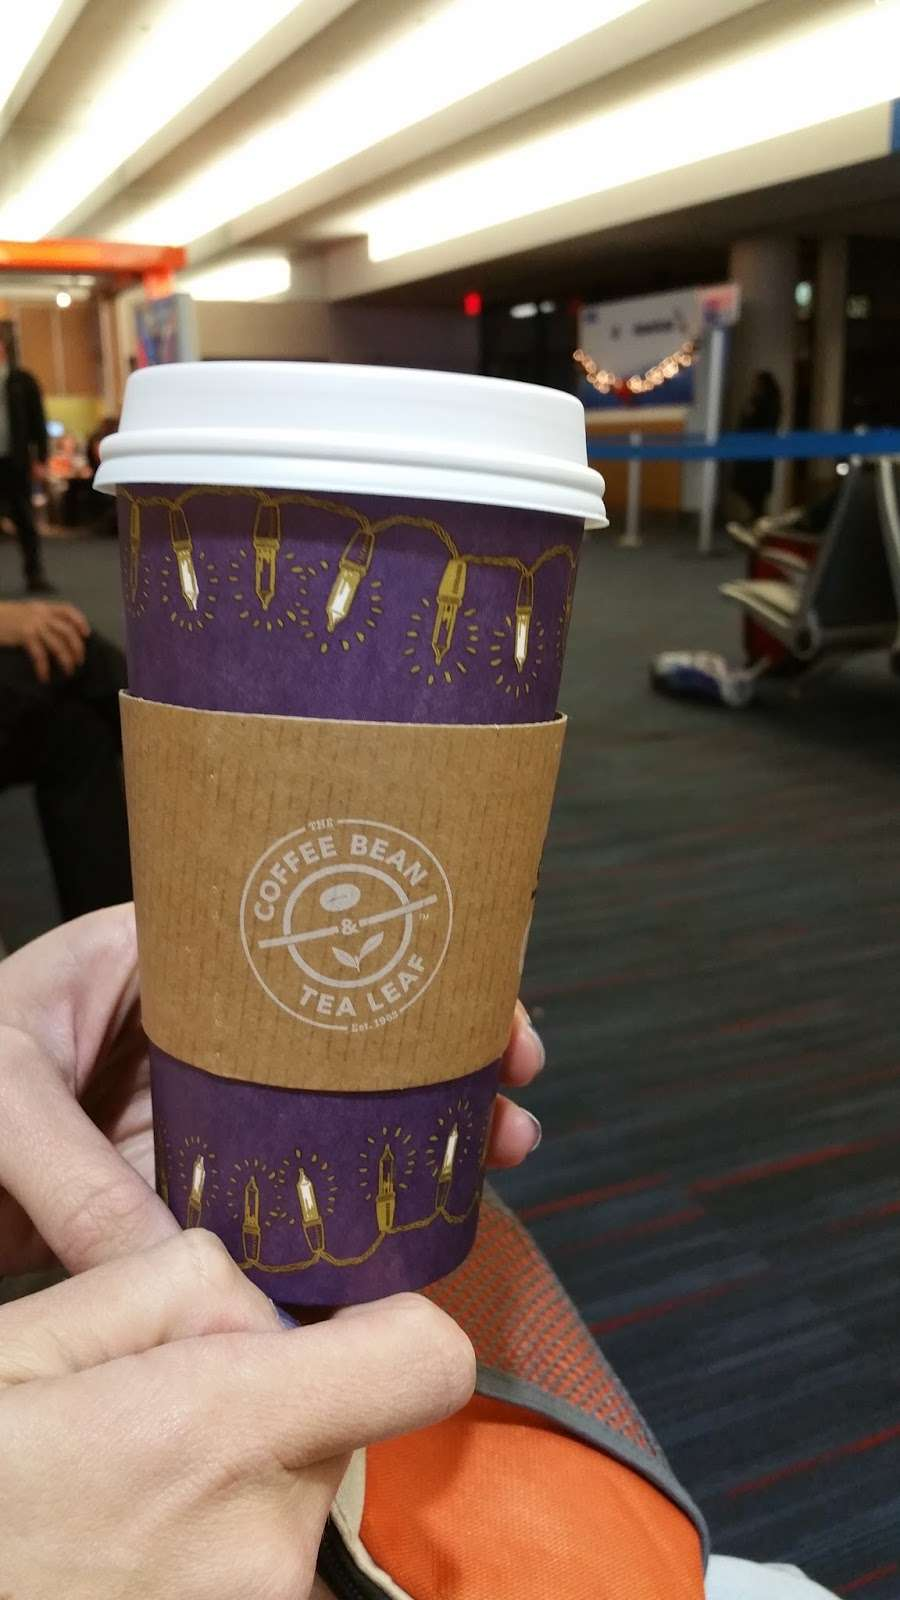 The Coffee Bean & Tea Leaf - cafe  | Photo 7 of 10 | Address: 550 World Way, Los Angeles, CA 90045, USA | Phone: (310) 337-1011